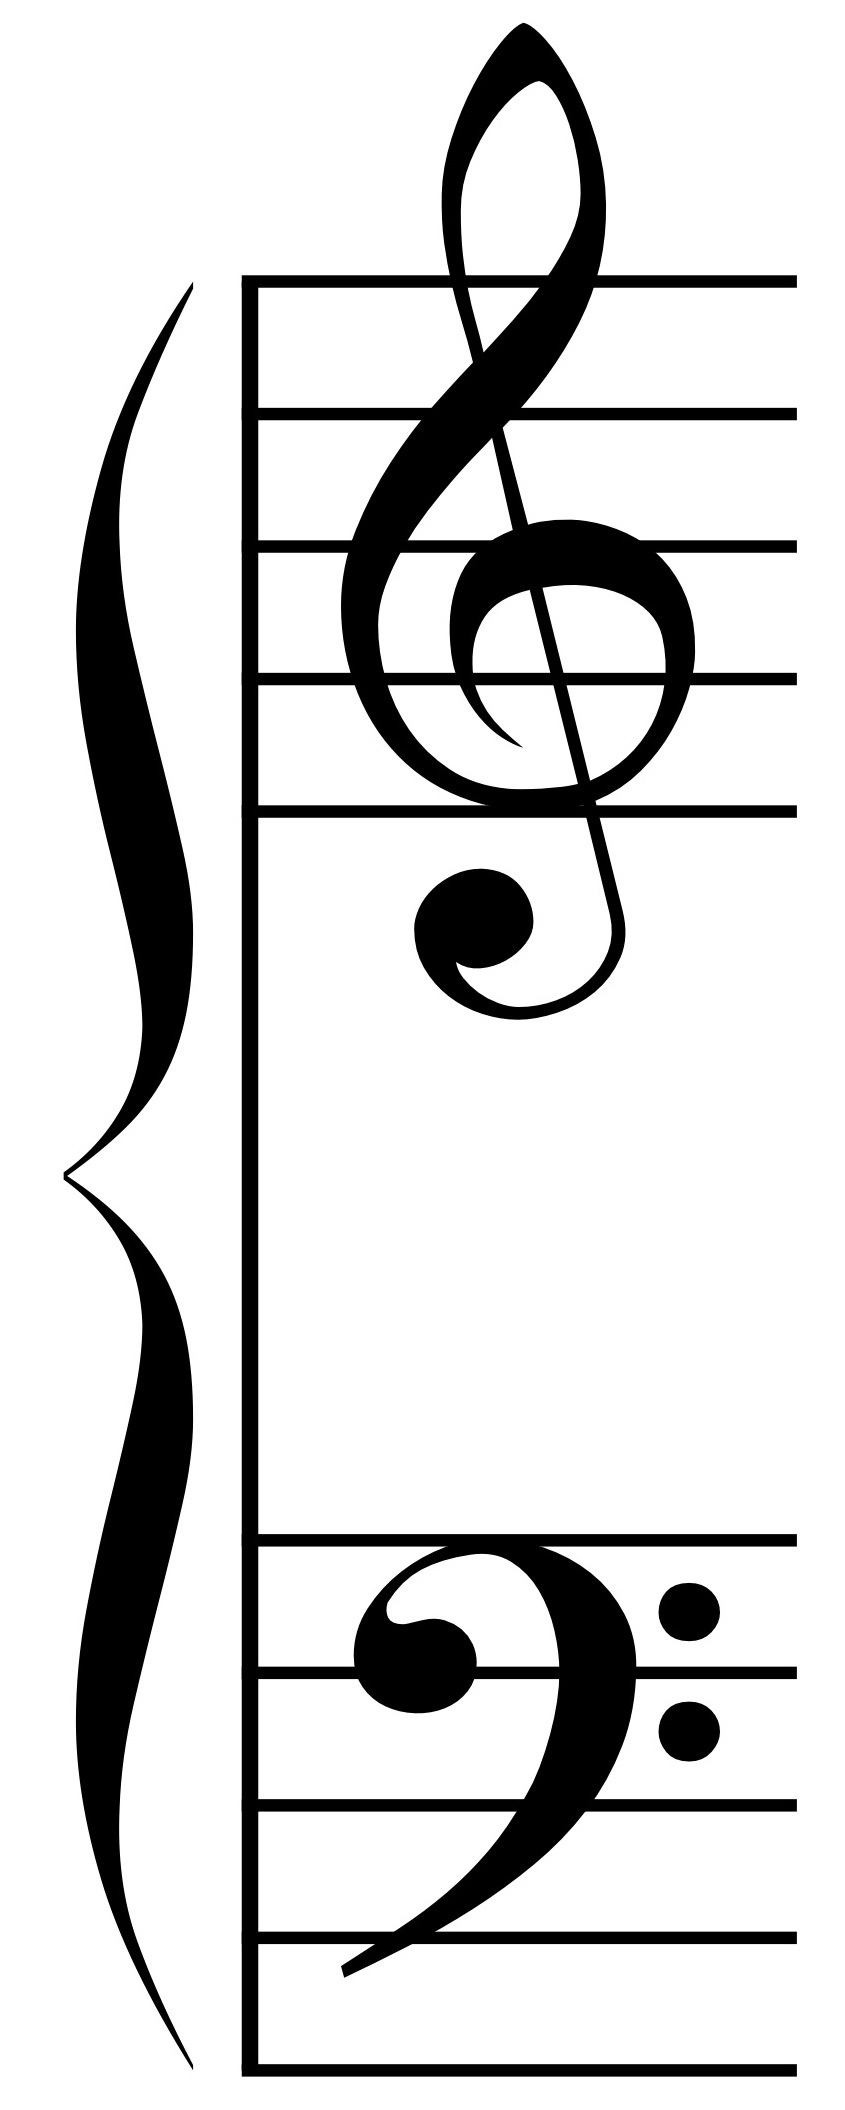 Braces clipart music. Observations about brace design